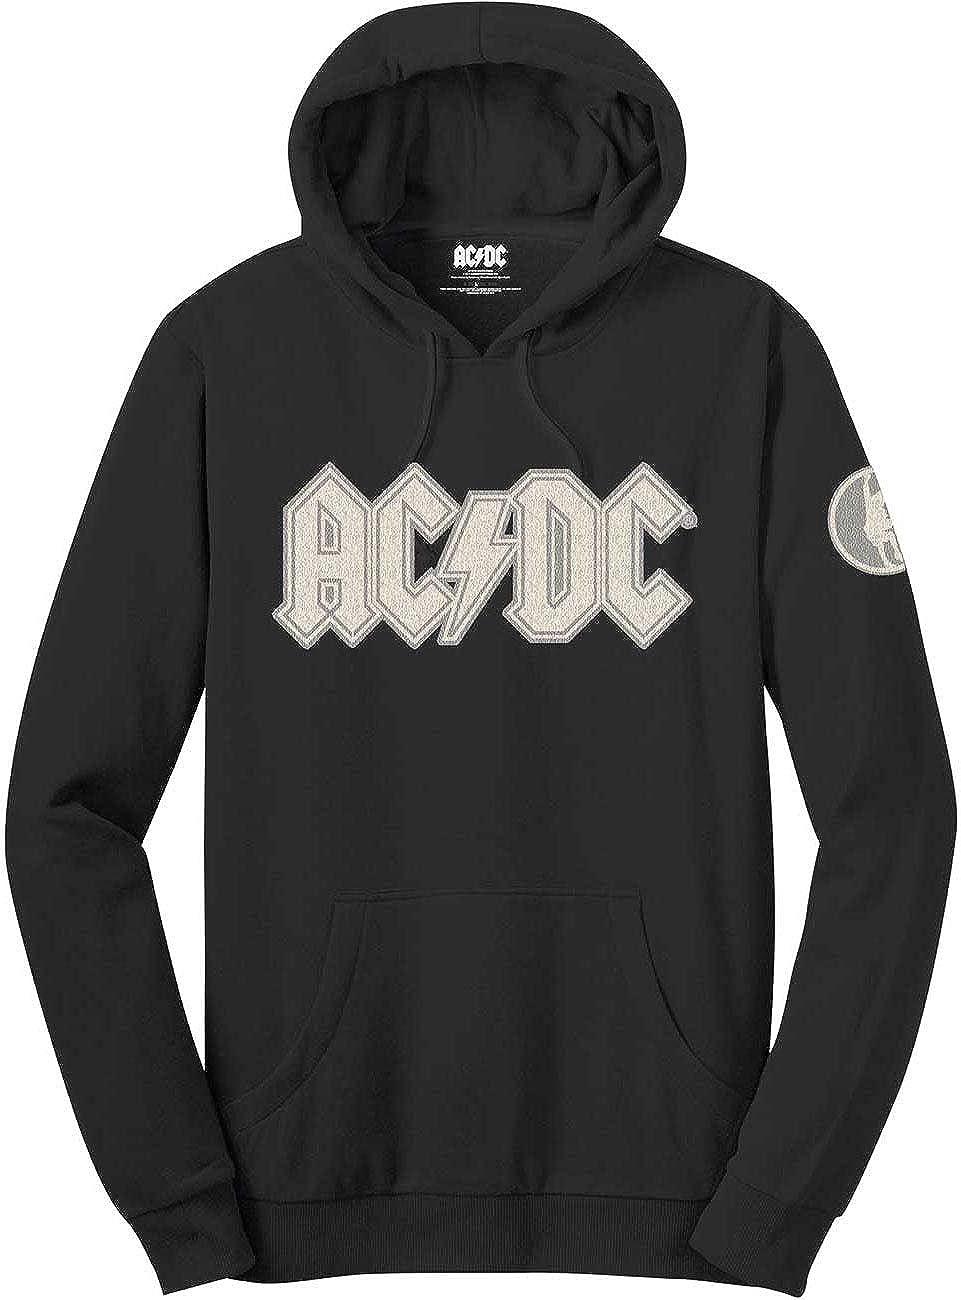 AC/DC ACDC Classic Band Logo Angus Young Hoodie Sweatshirt Applique Motifs Schwarz